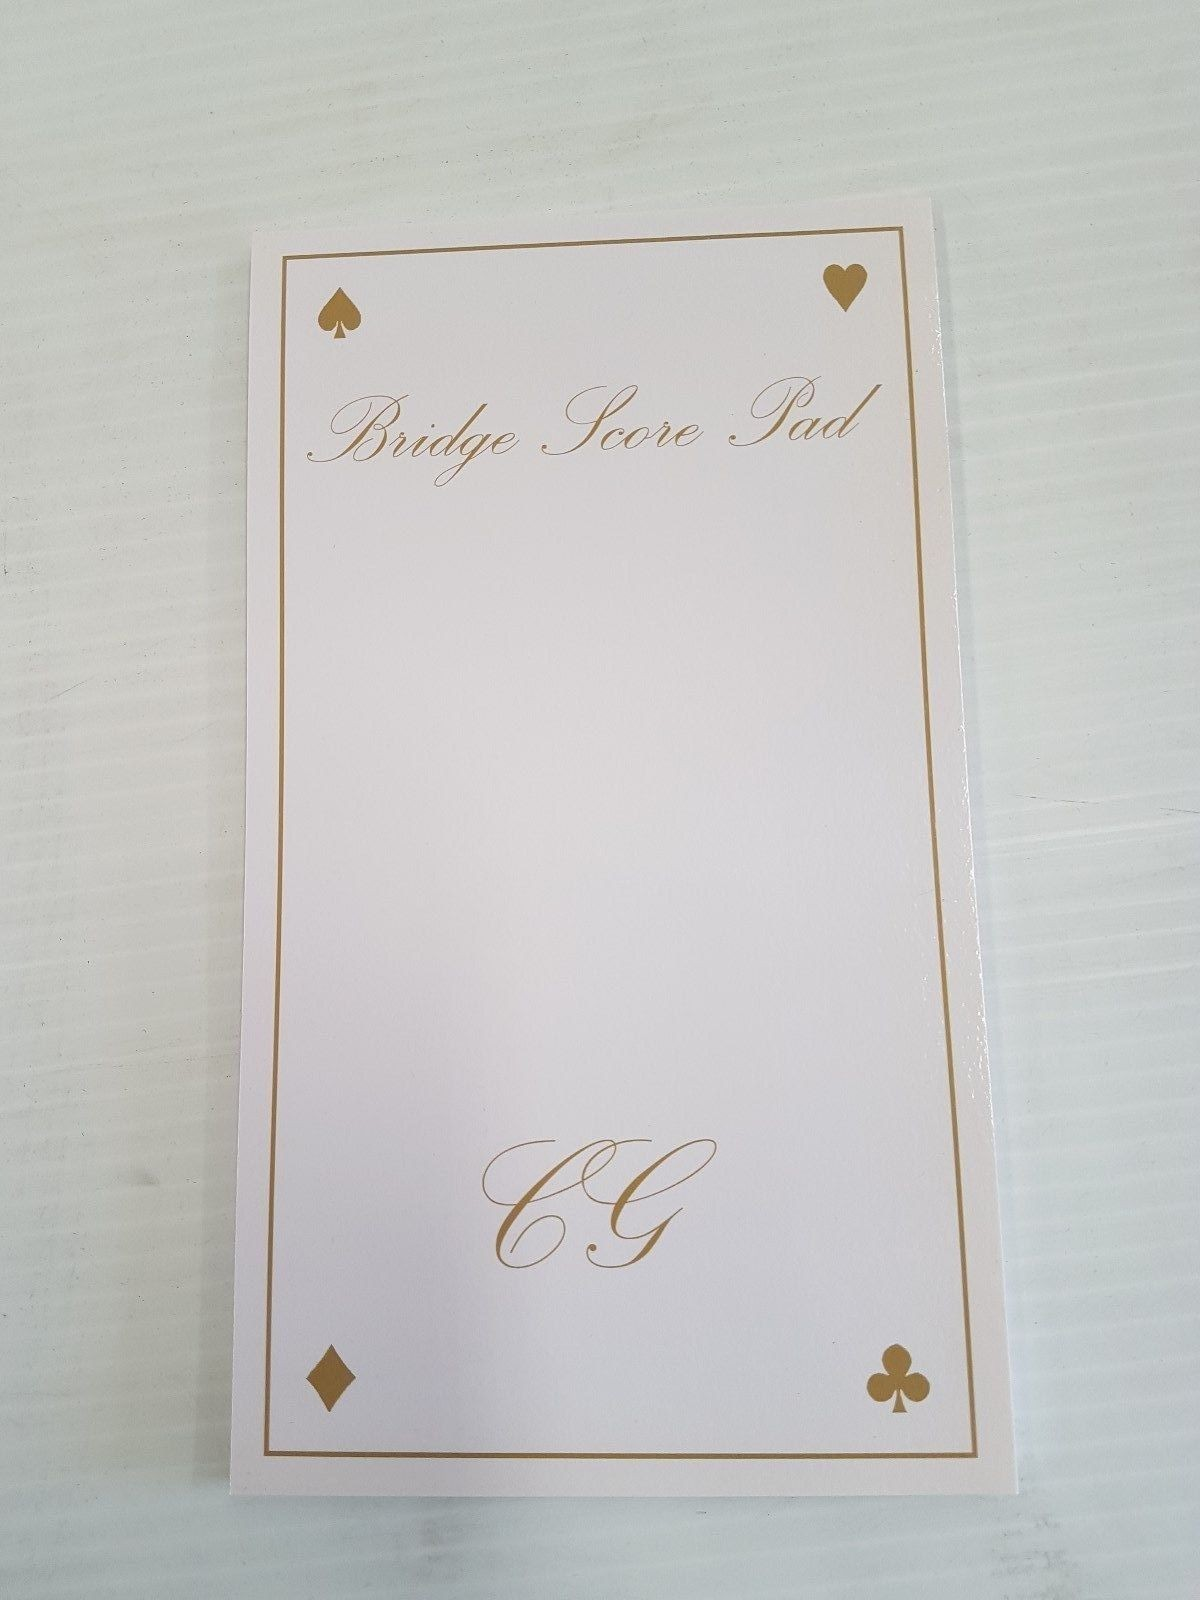 Bridge - Bridge score pad, Australian made, single